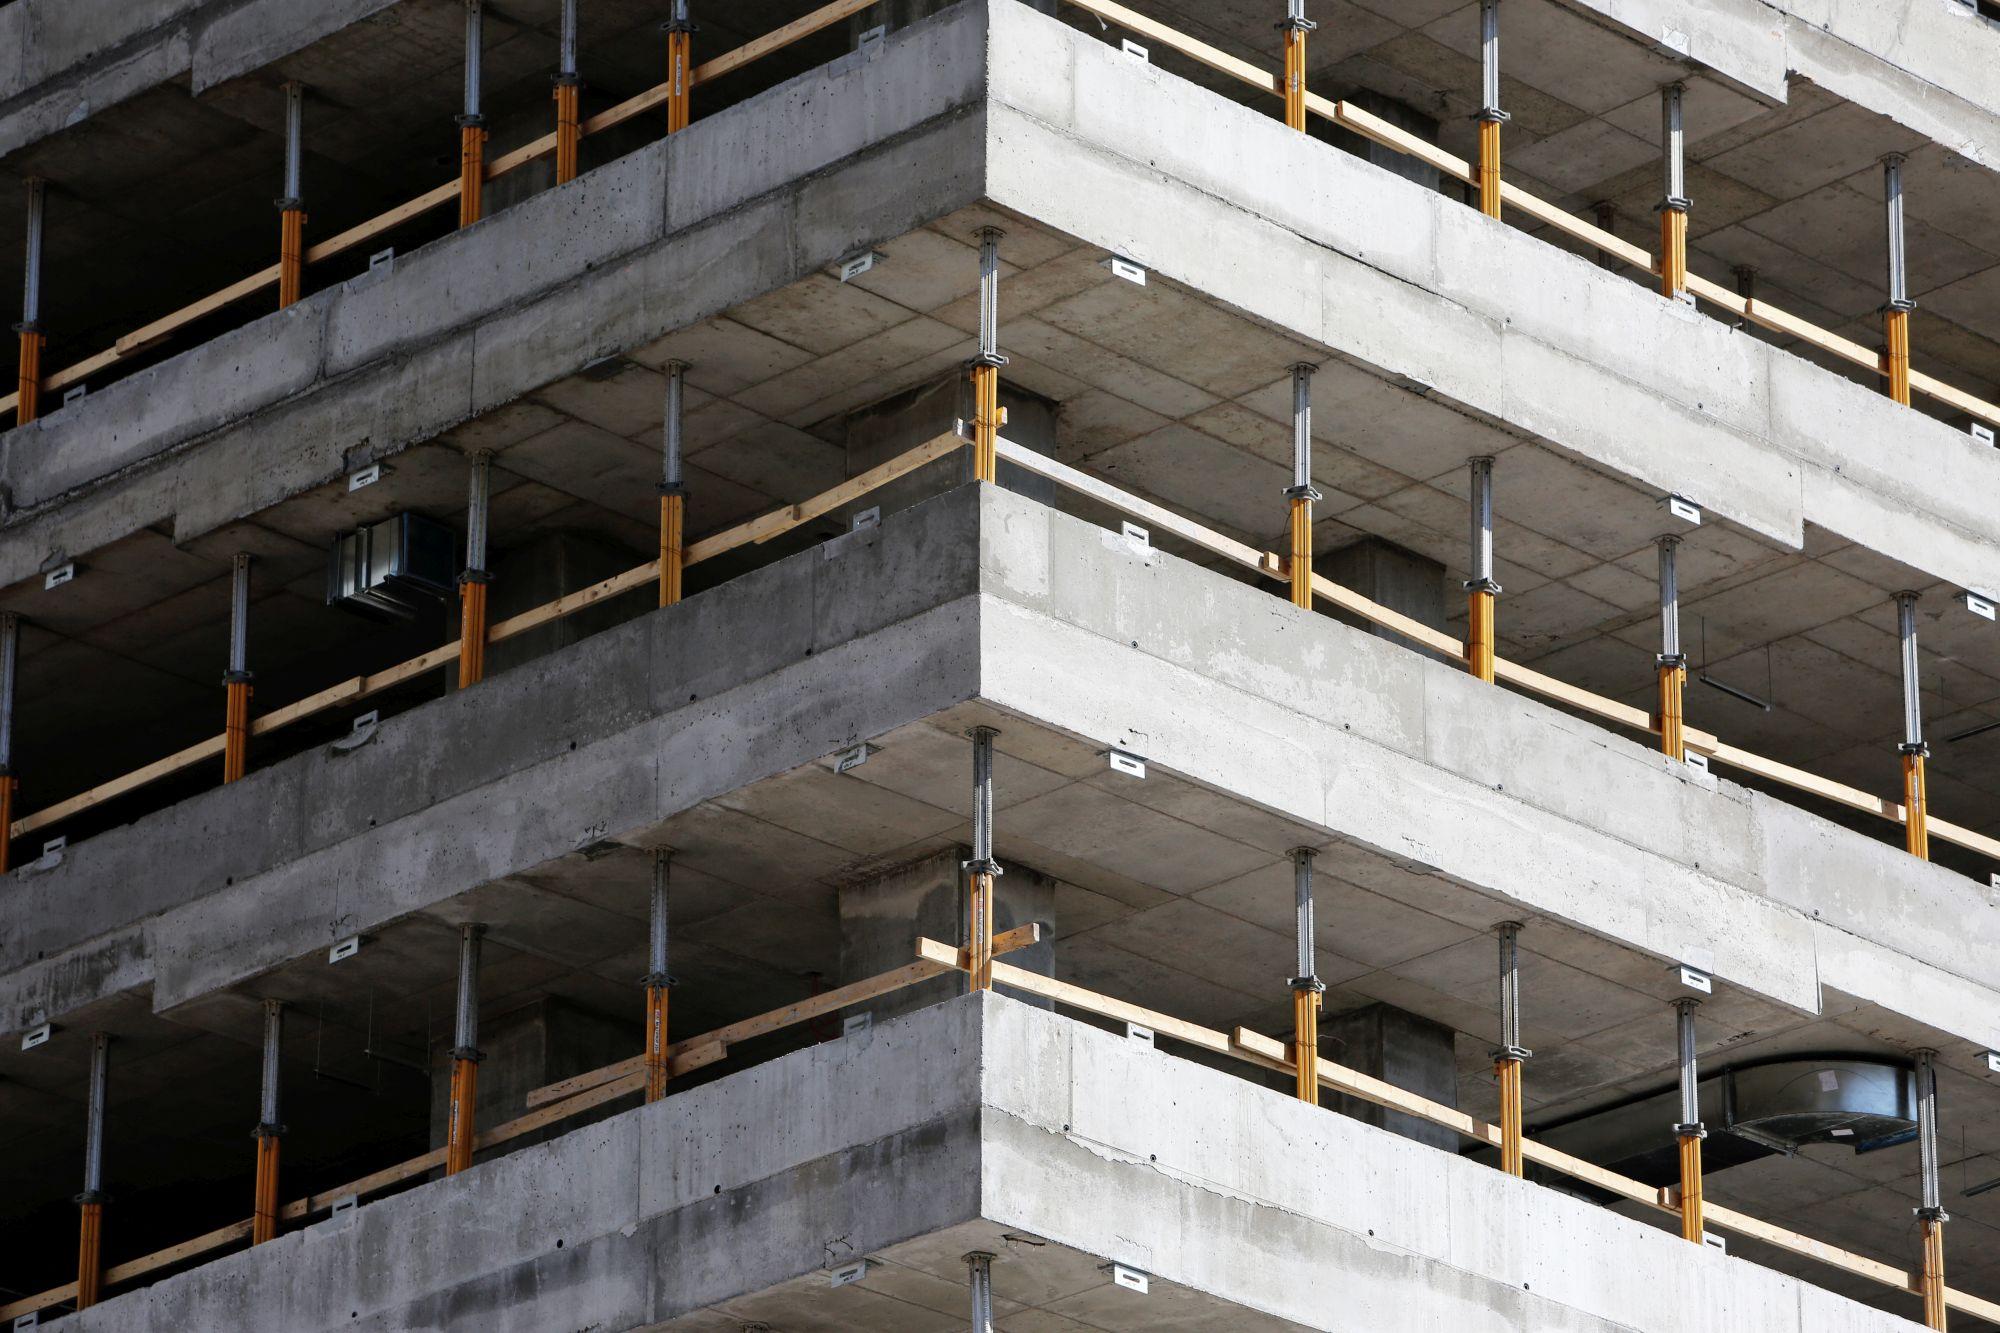 Concrete Building Frame